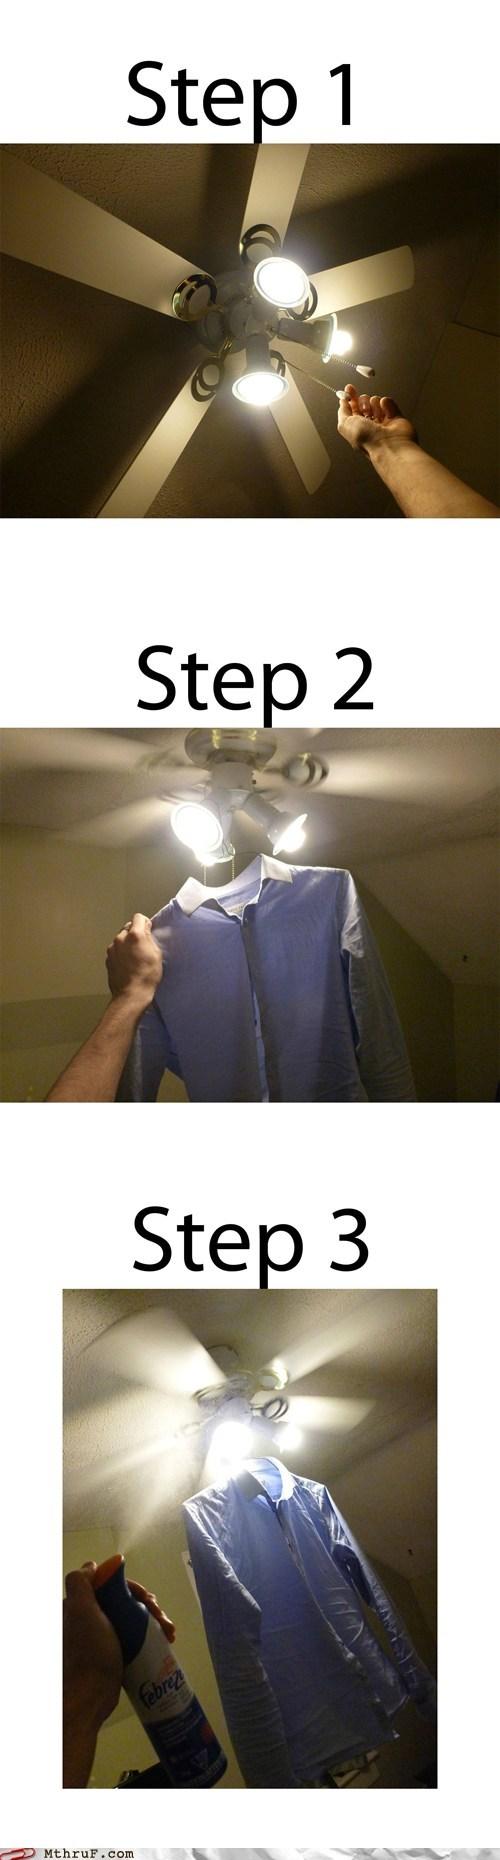 ceiling fan febreeze fresh shirt - 5916364032